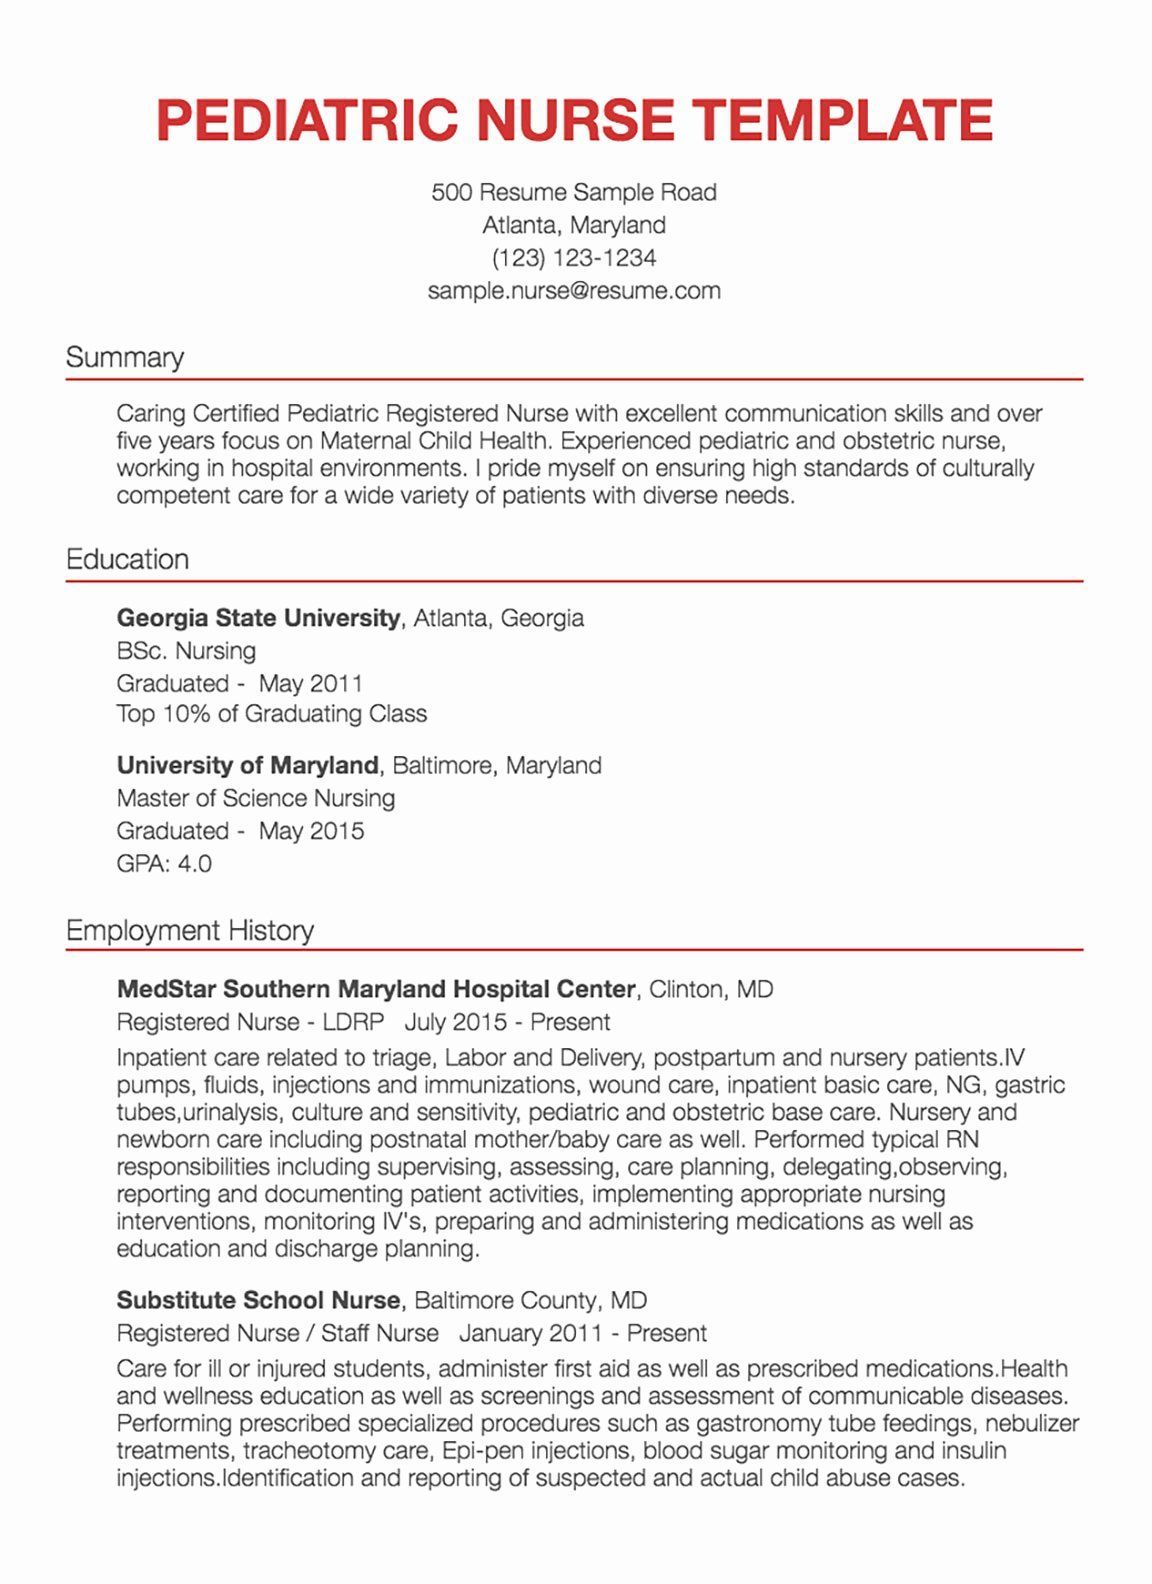 10 Customer Resume skills format project in 2020 Resume